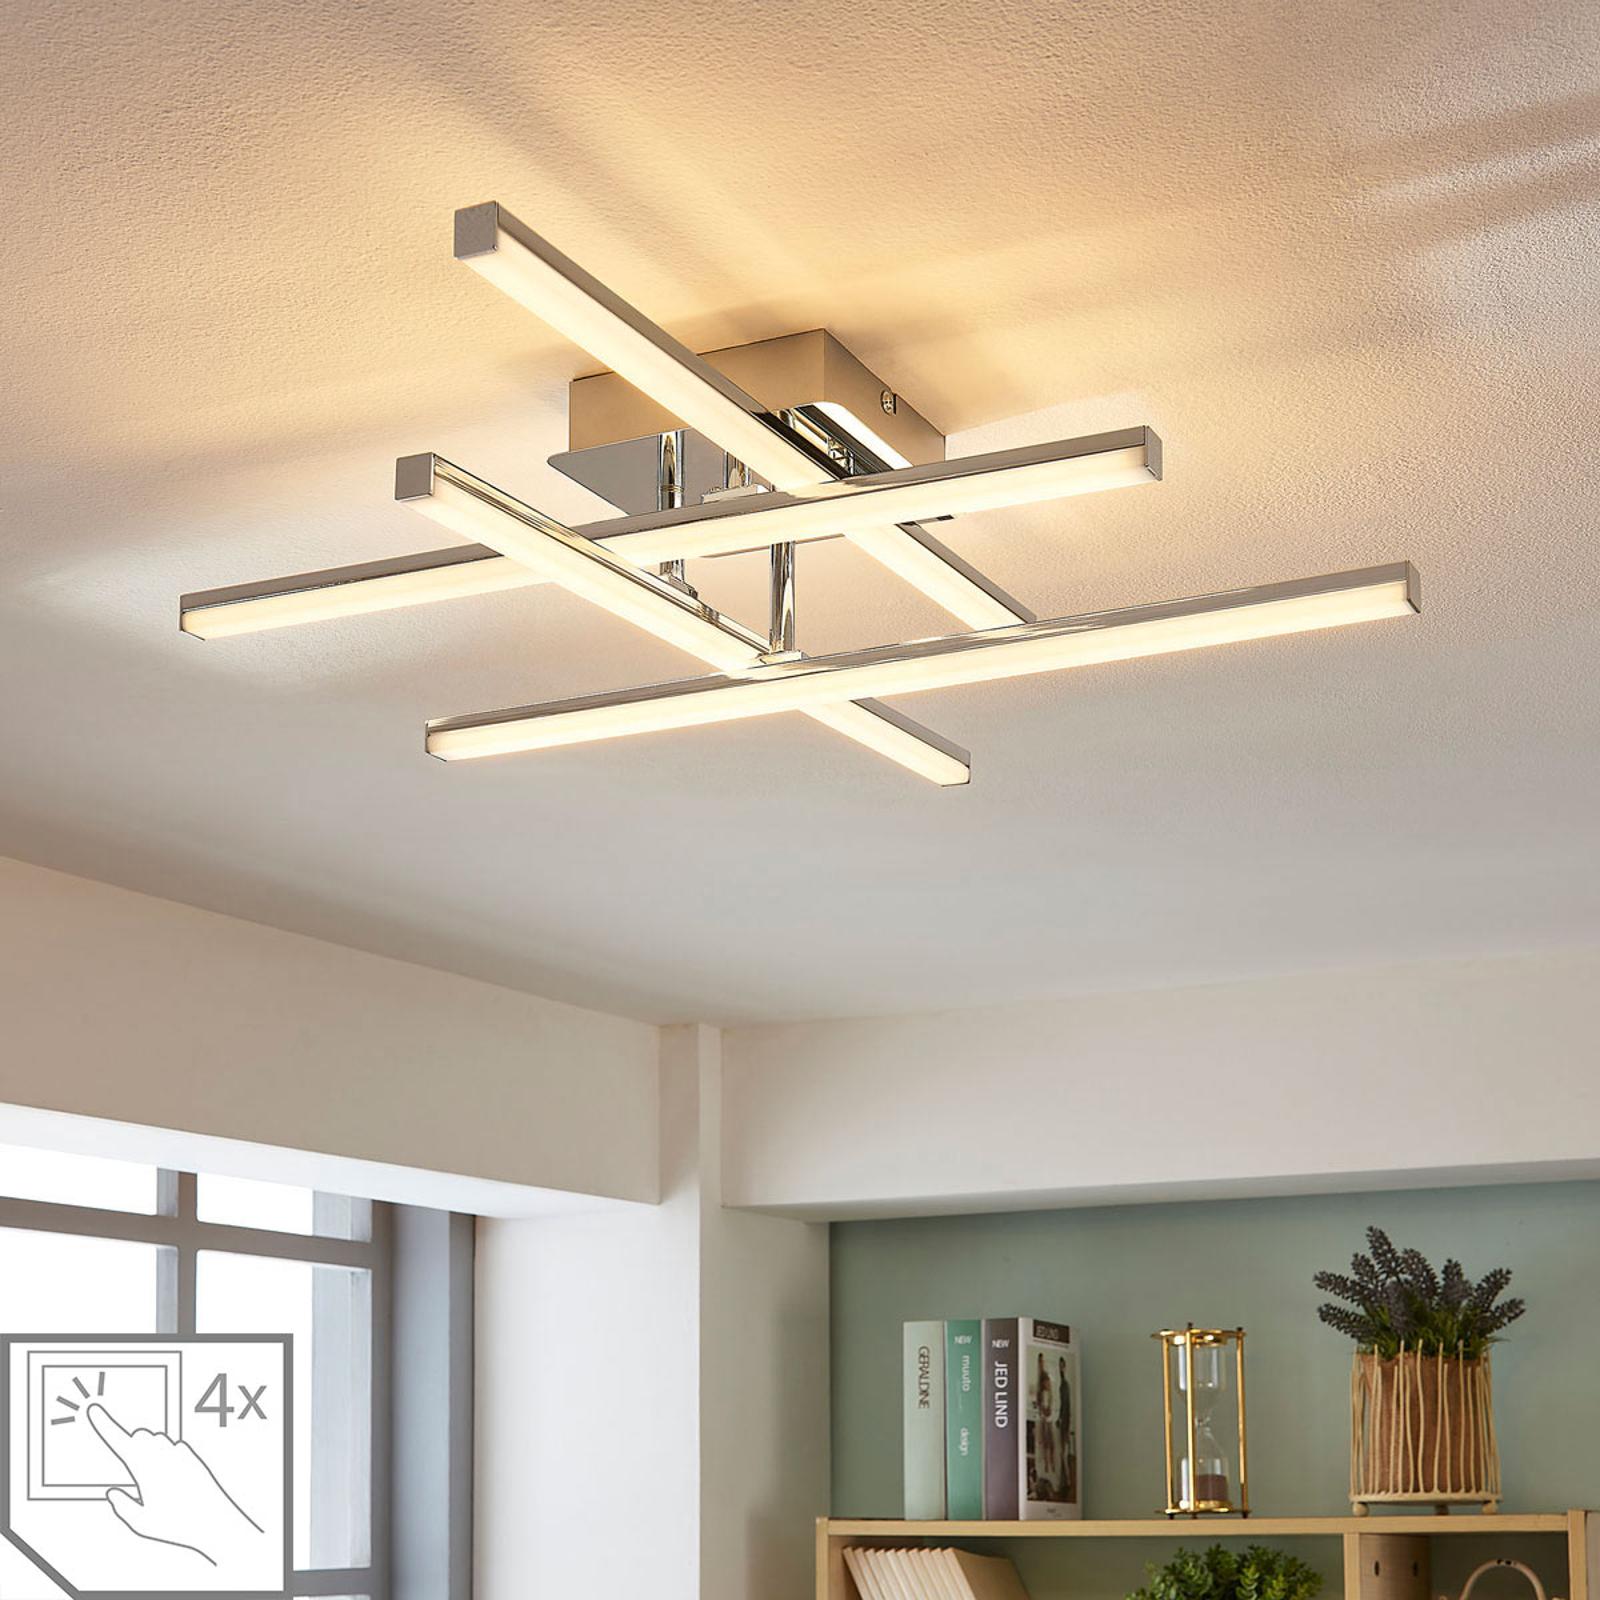 Justerbar LED-taklampa Korona, dimbar